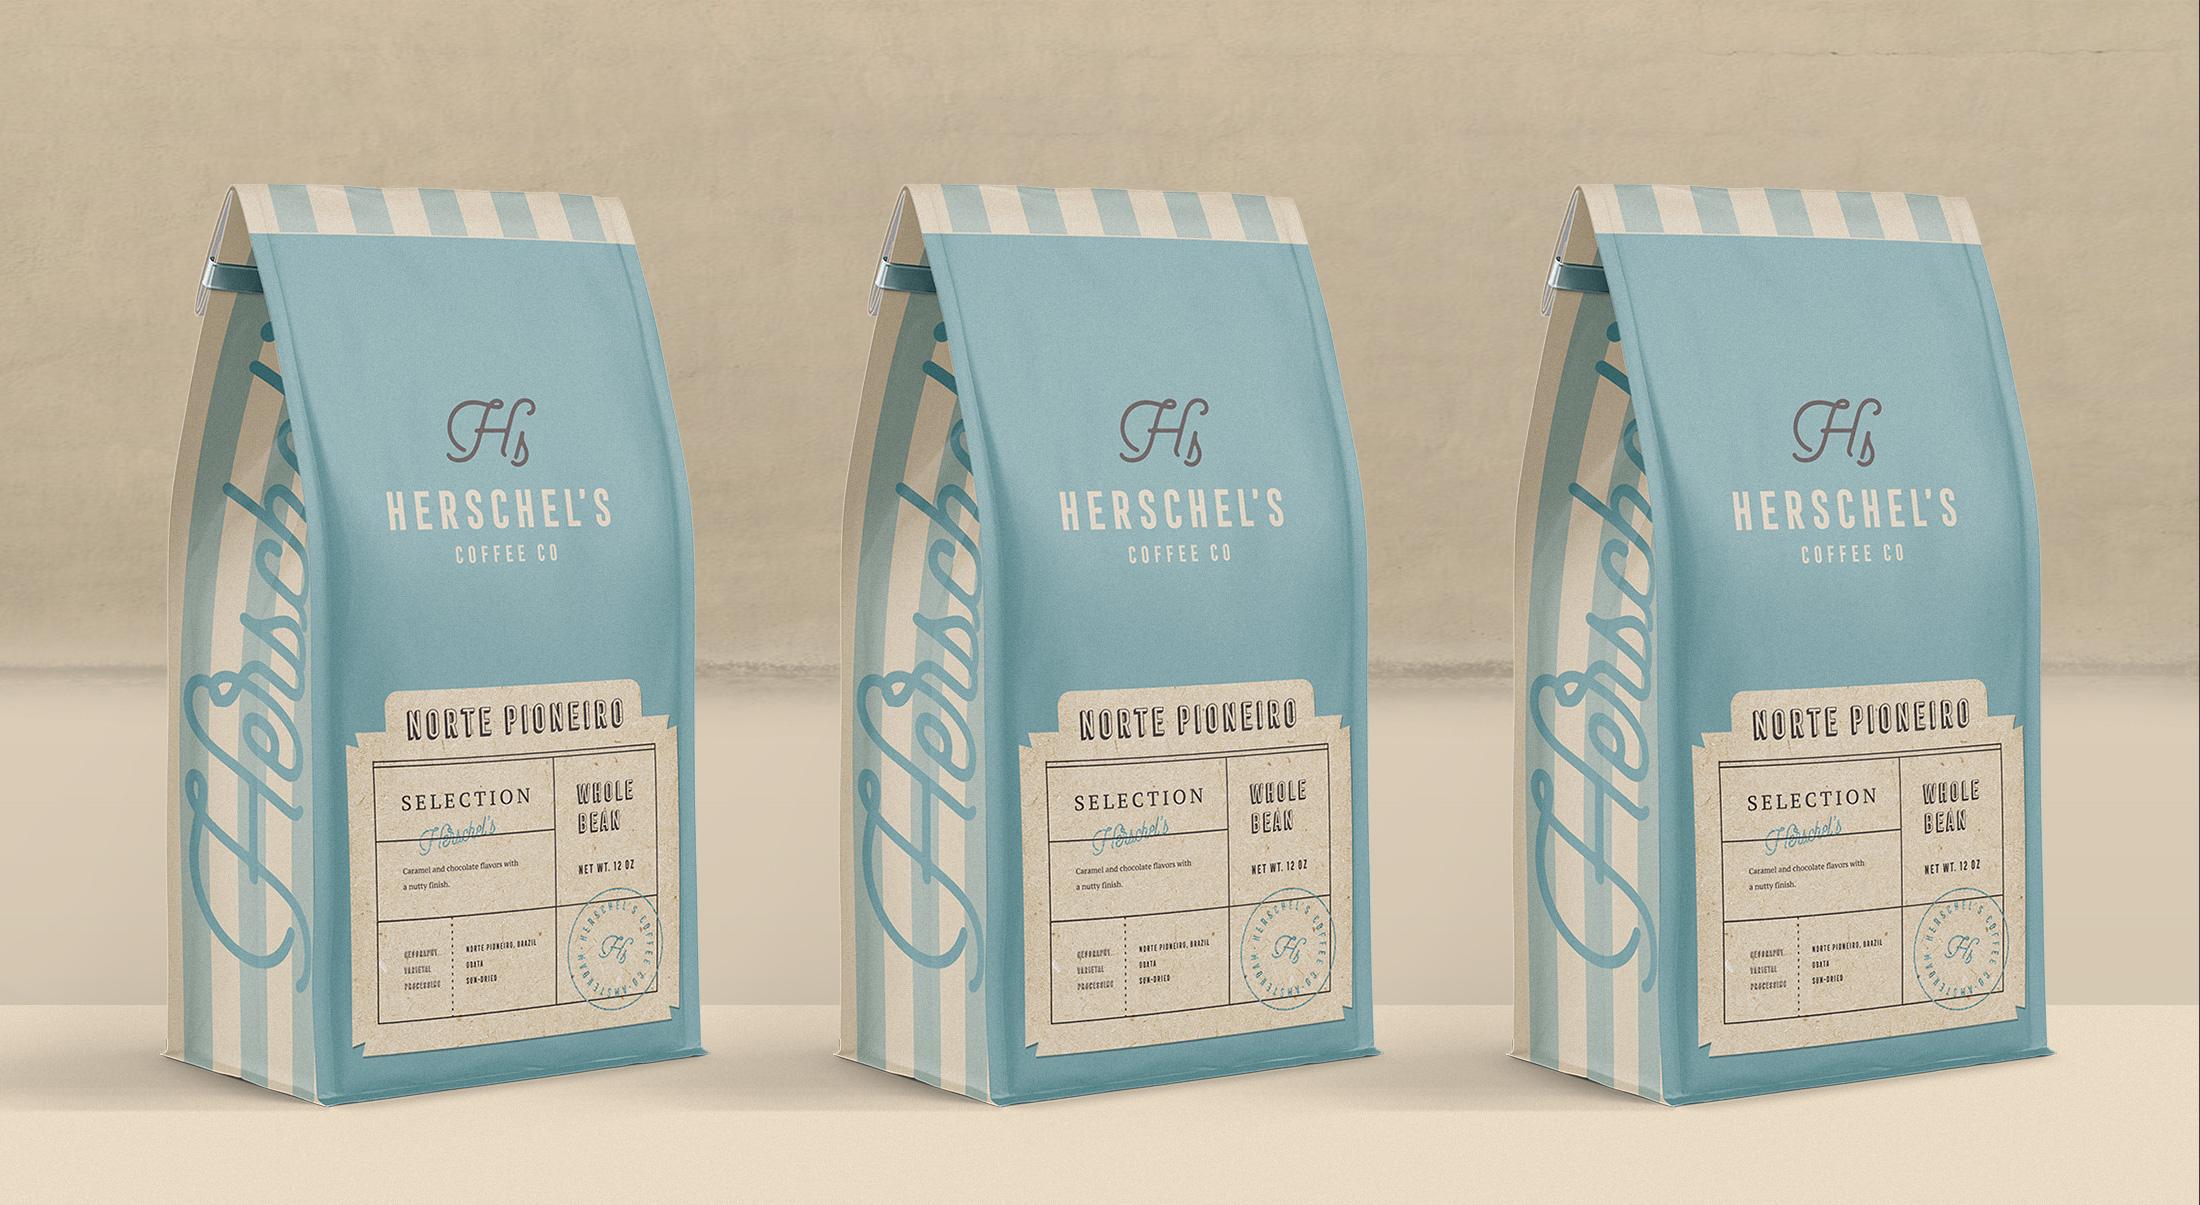 Branding and Packaging for Herschel's Coffee Co.